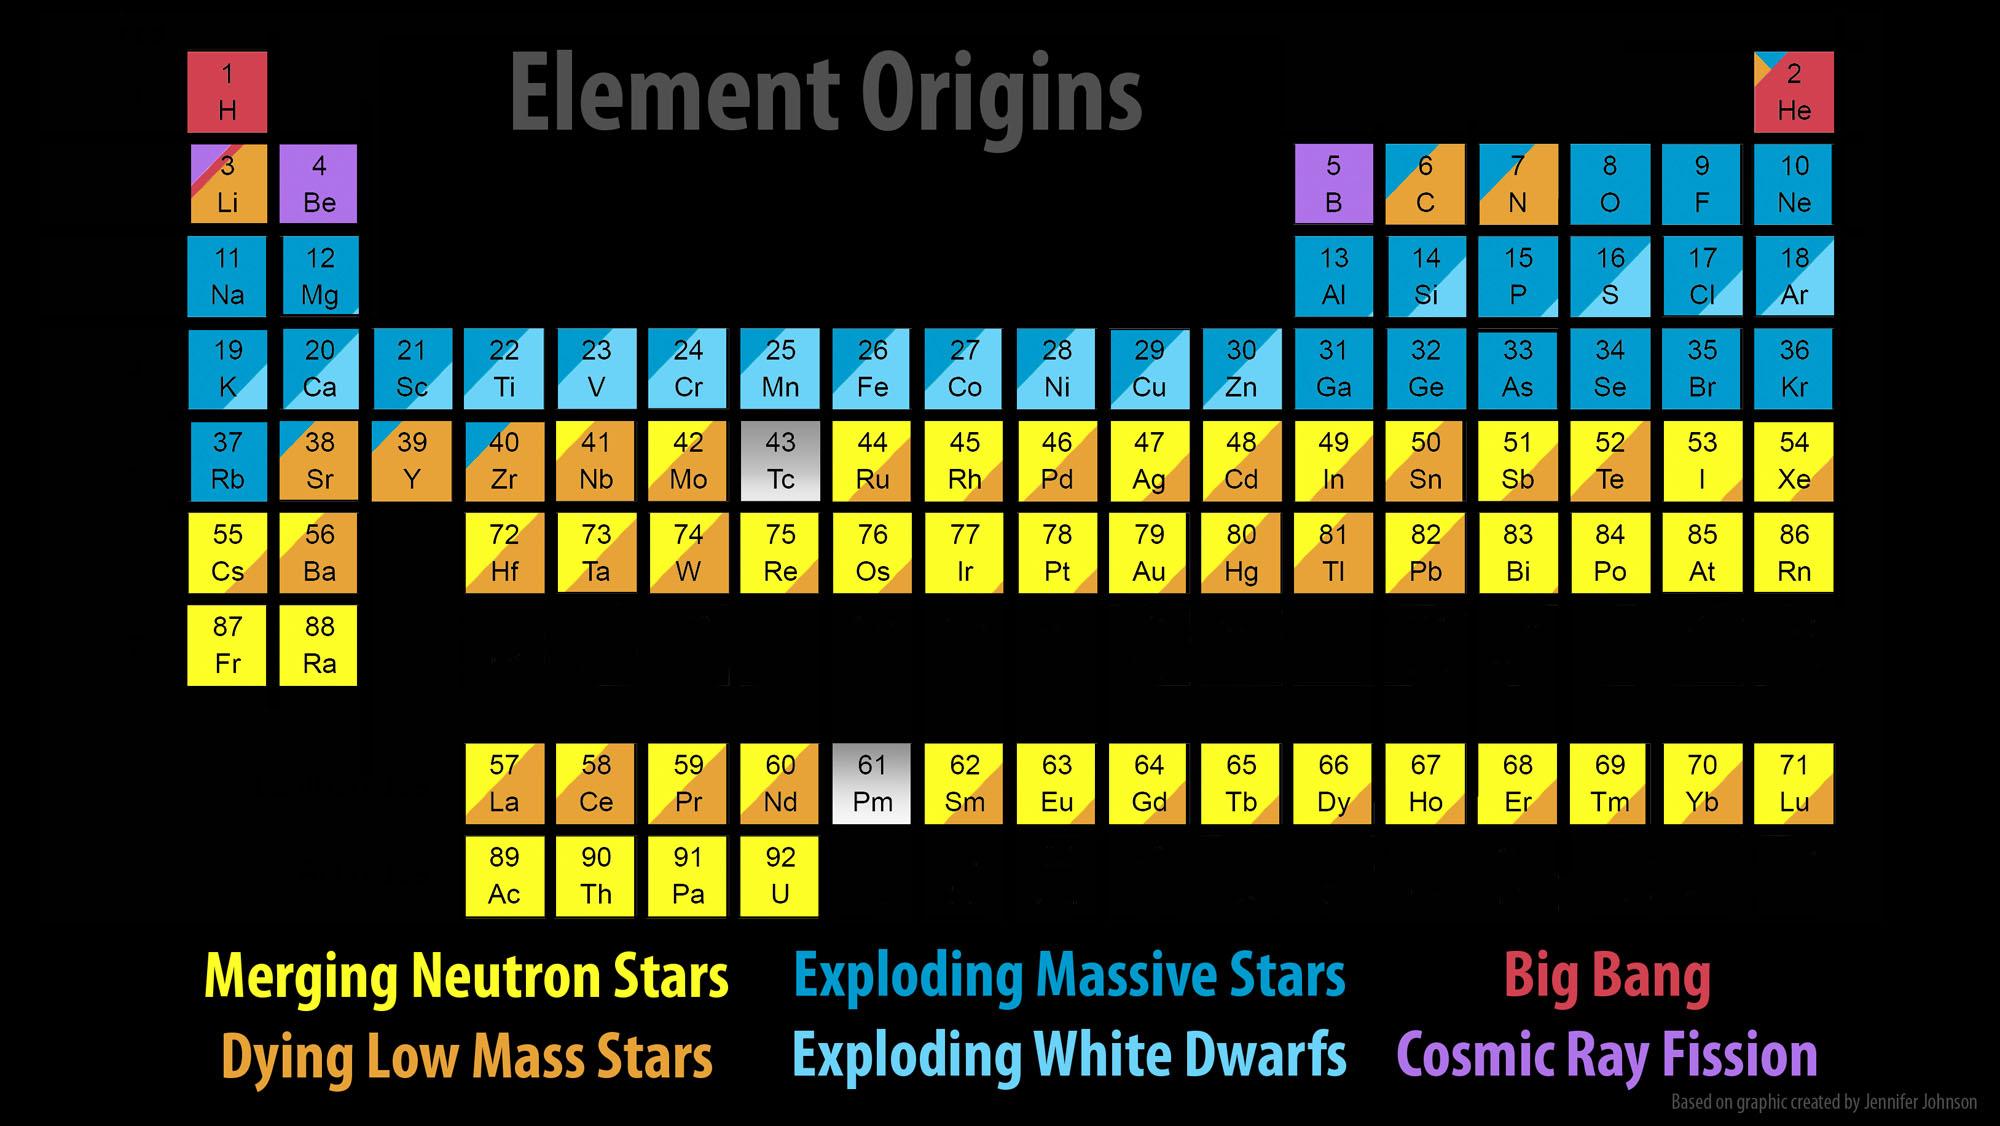 Caltech led ligo and astronomy teams strike gold growth news periodic table xflitez Choice Image